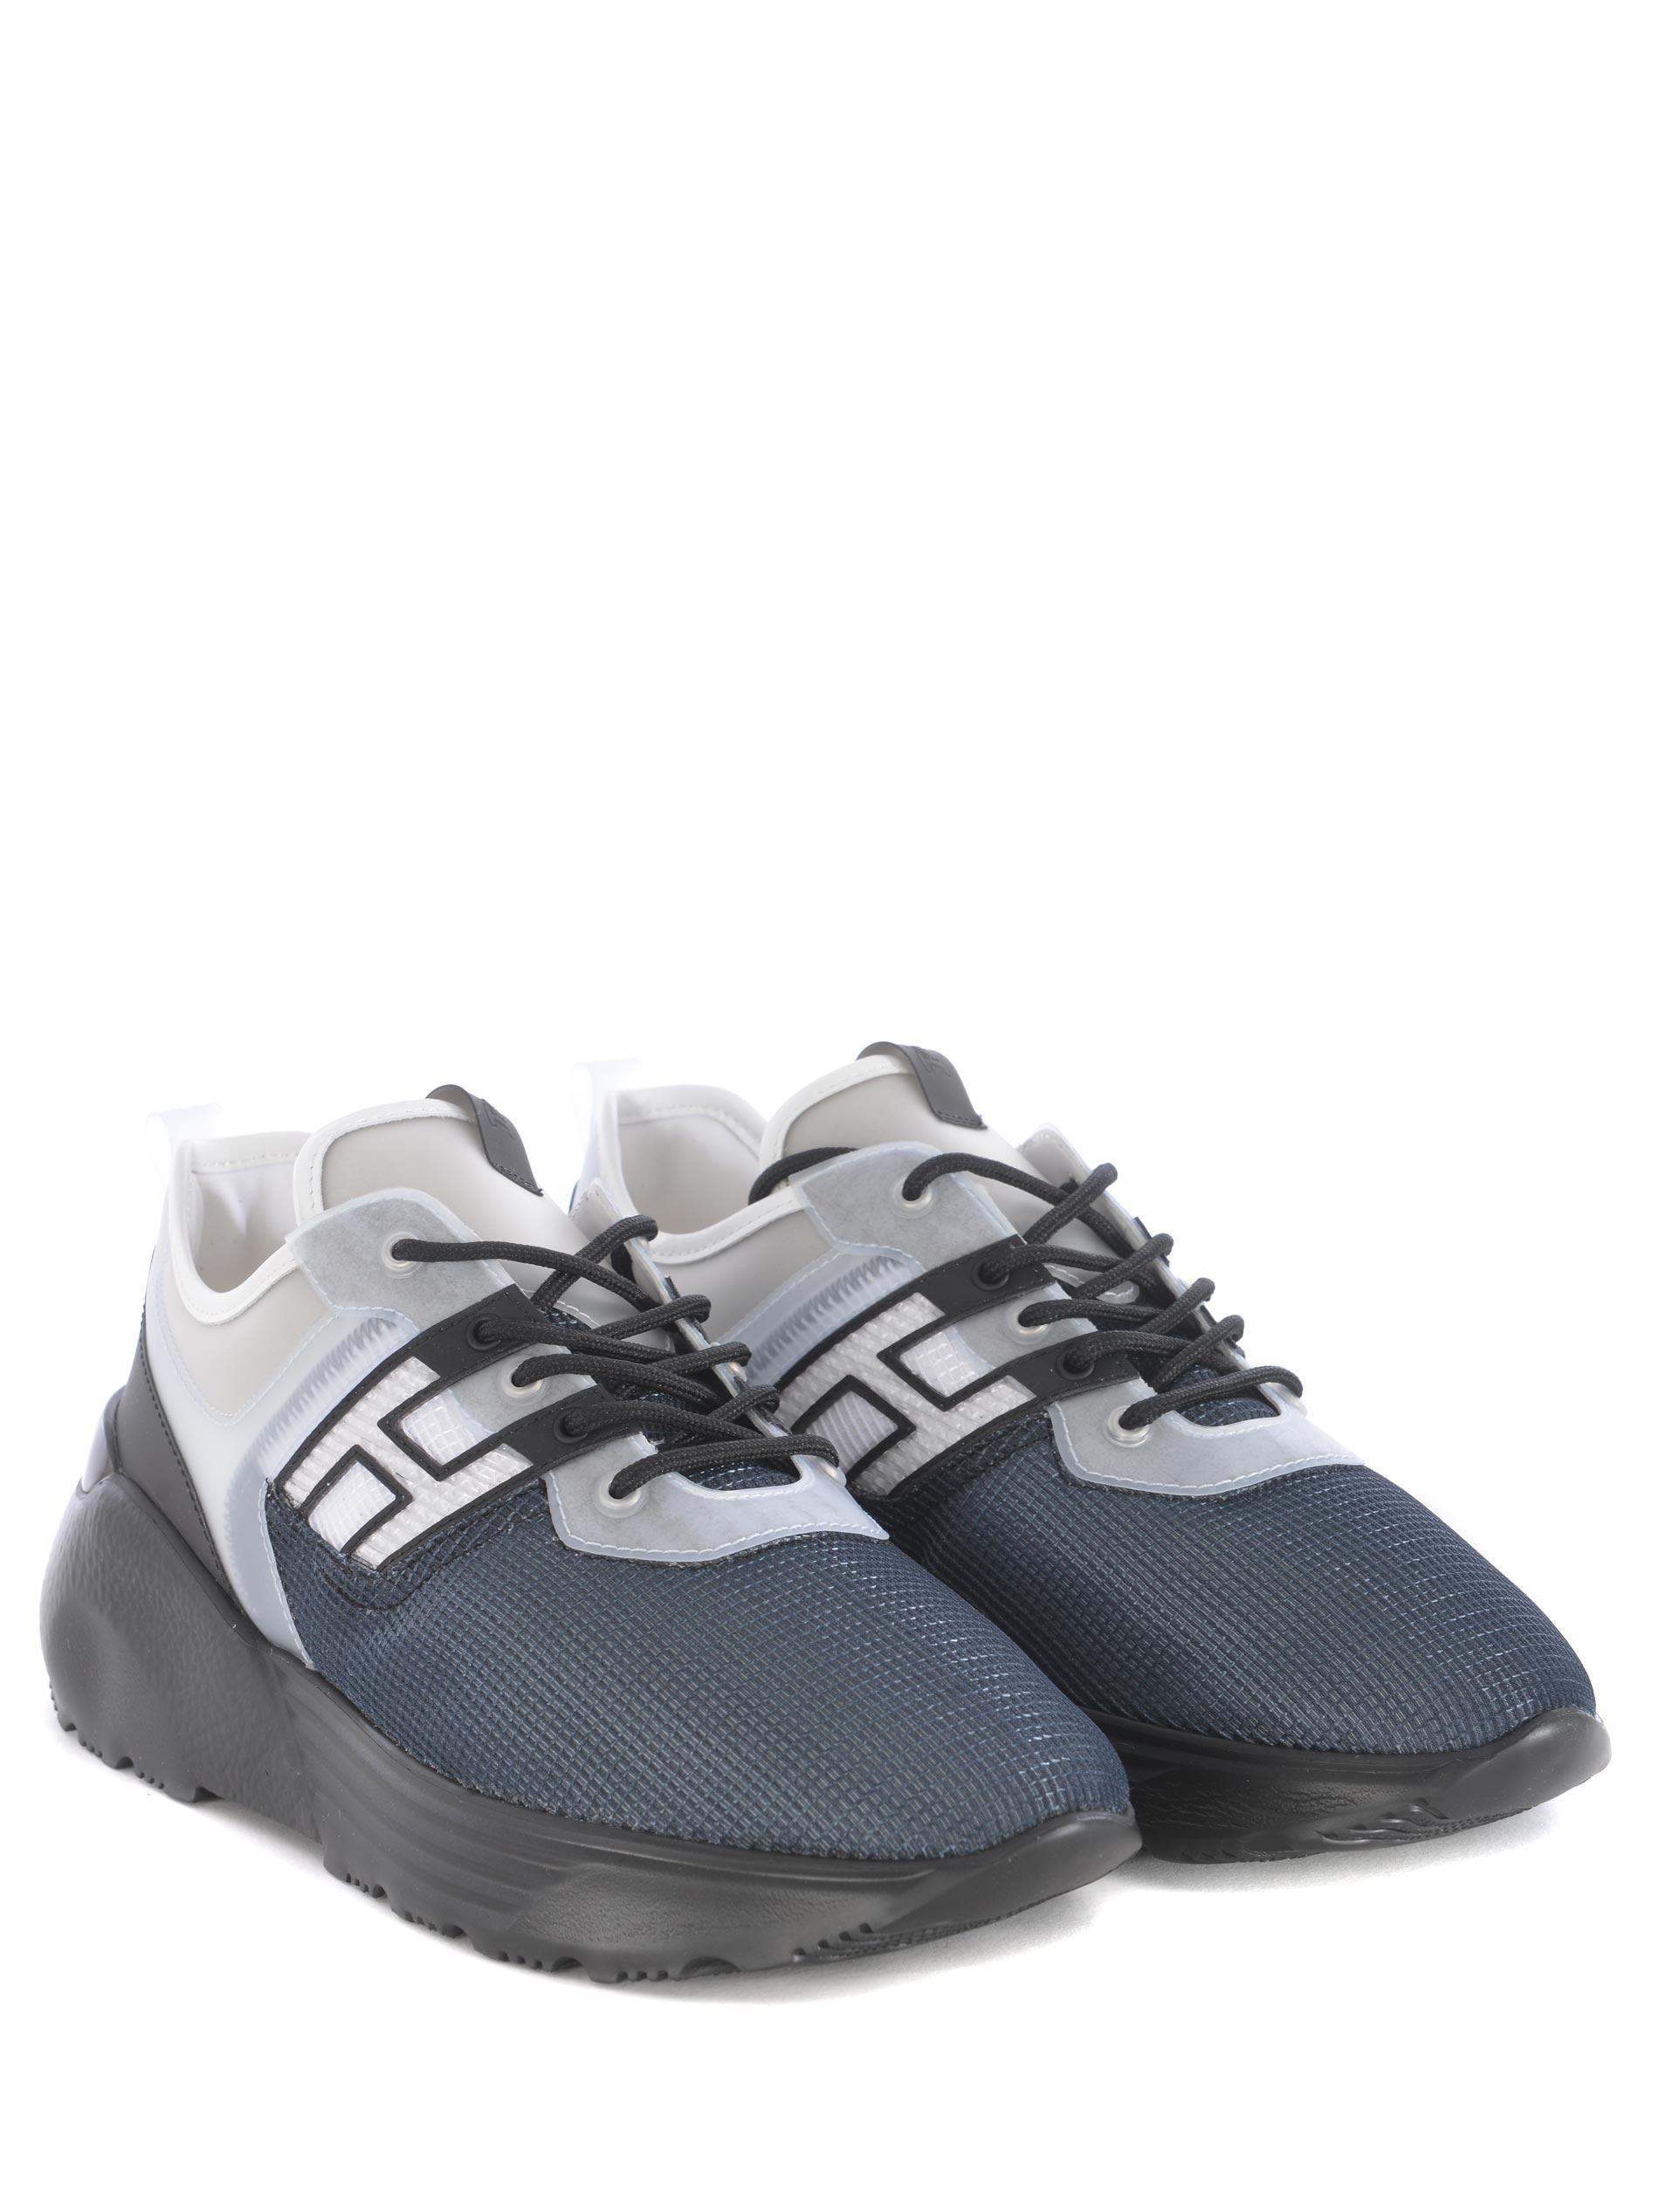 Sneakers uomo Hogan Active One